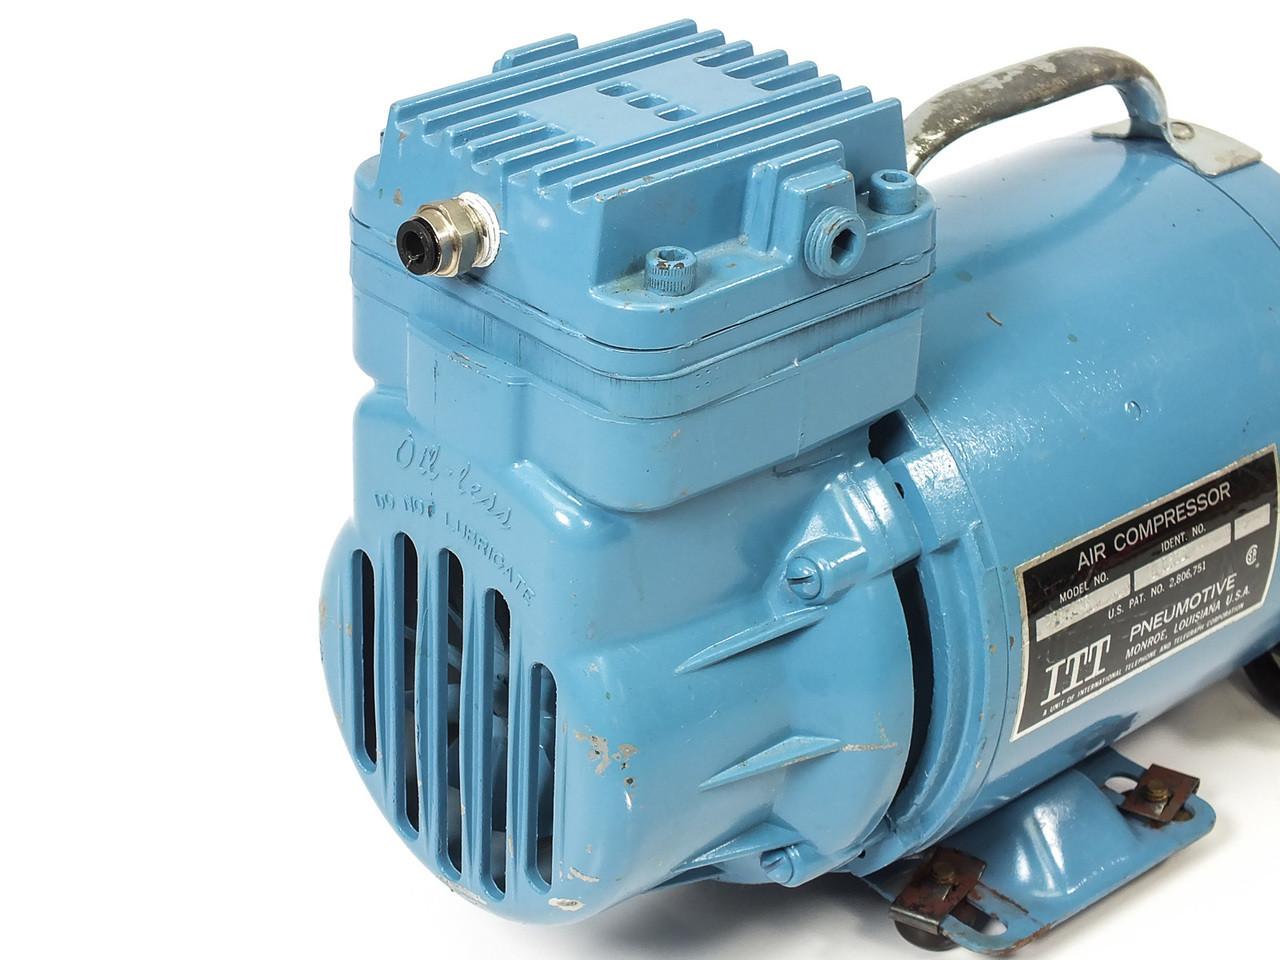 ITT 160203P LGH-106 Air Compressor 1/12 HP 115 VAC 1.2 CFM ...